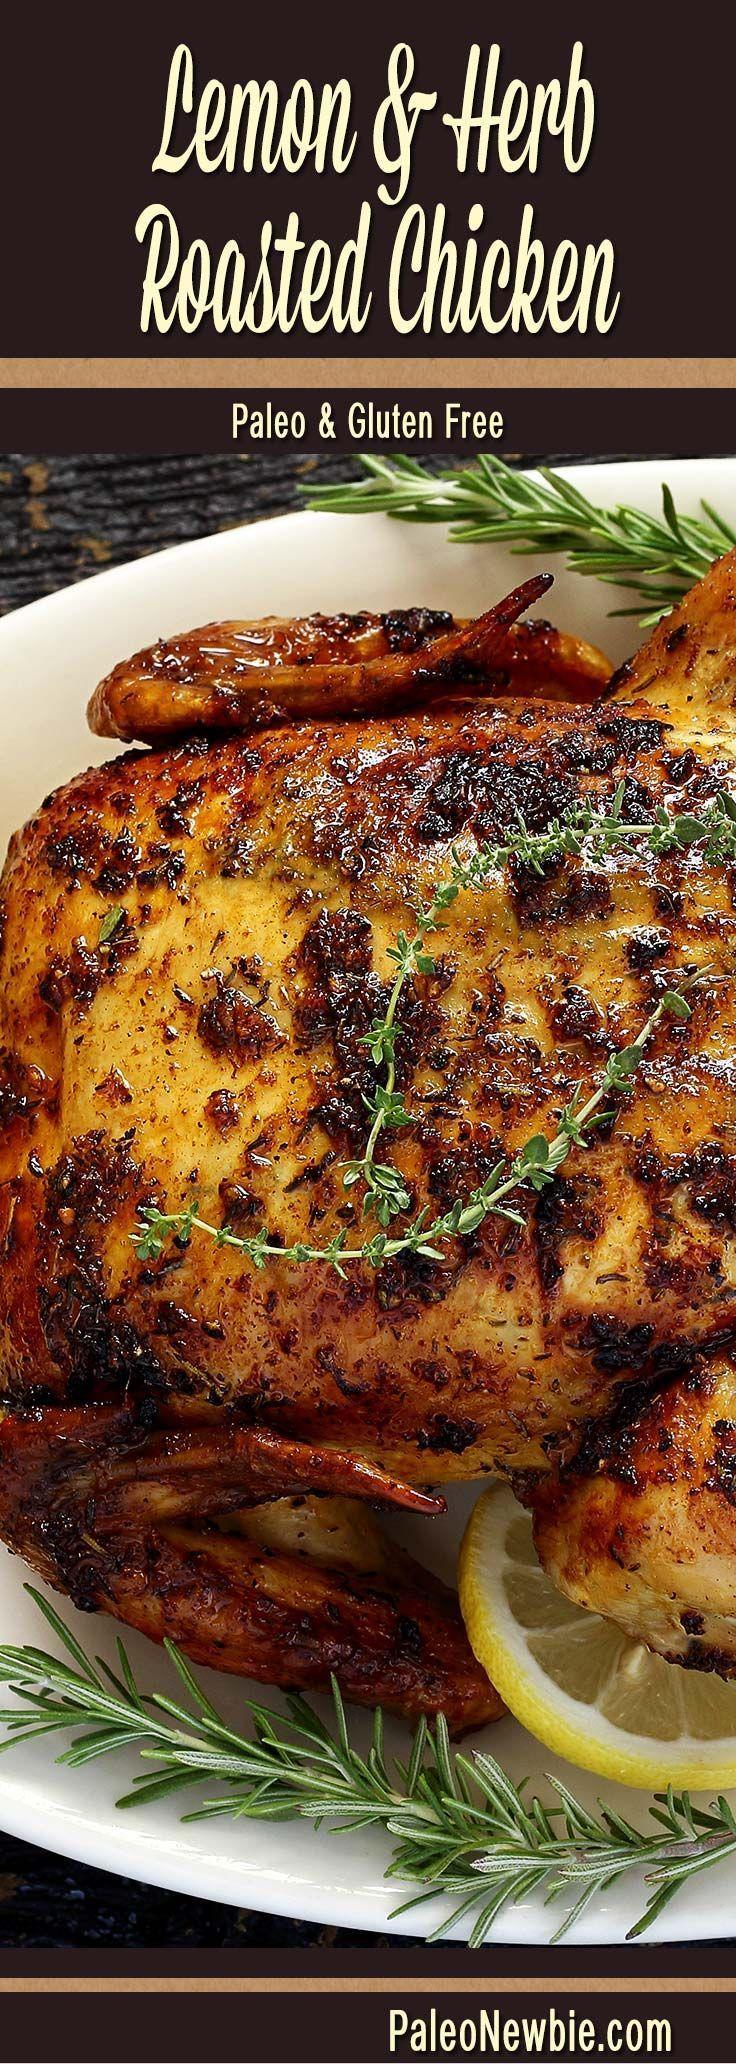 25 Bsta Whole Chicken Recipes Oven Iderna P Pinterest -6620